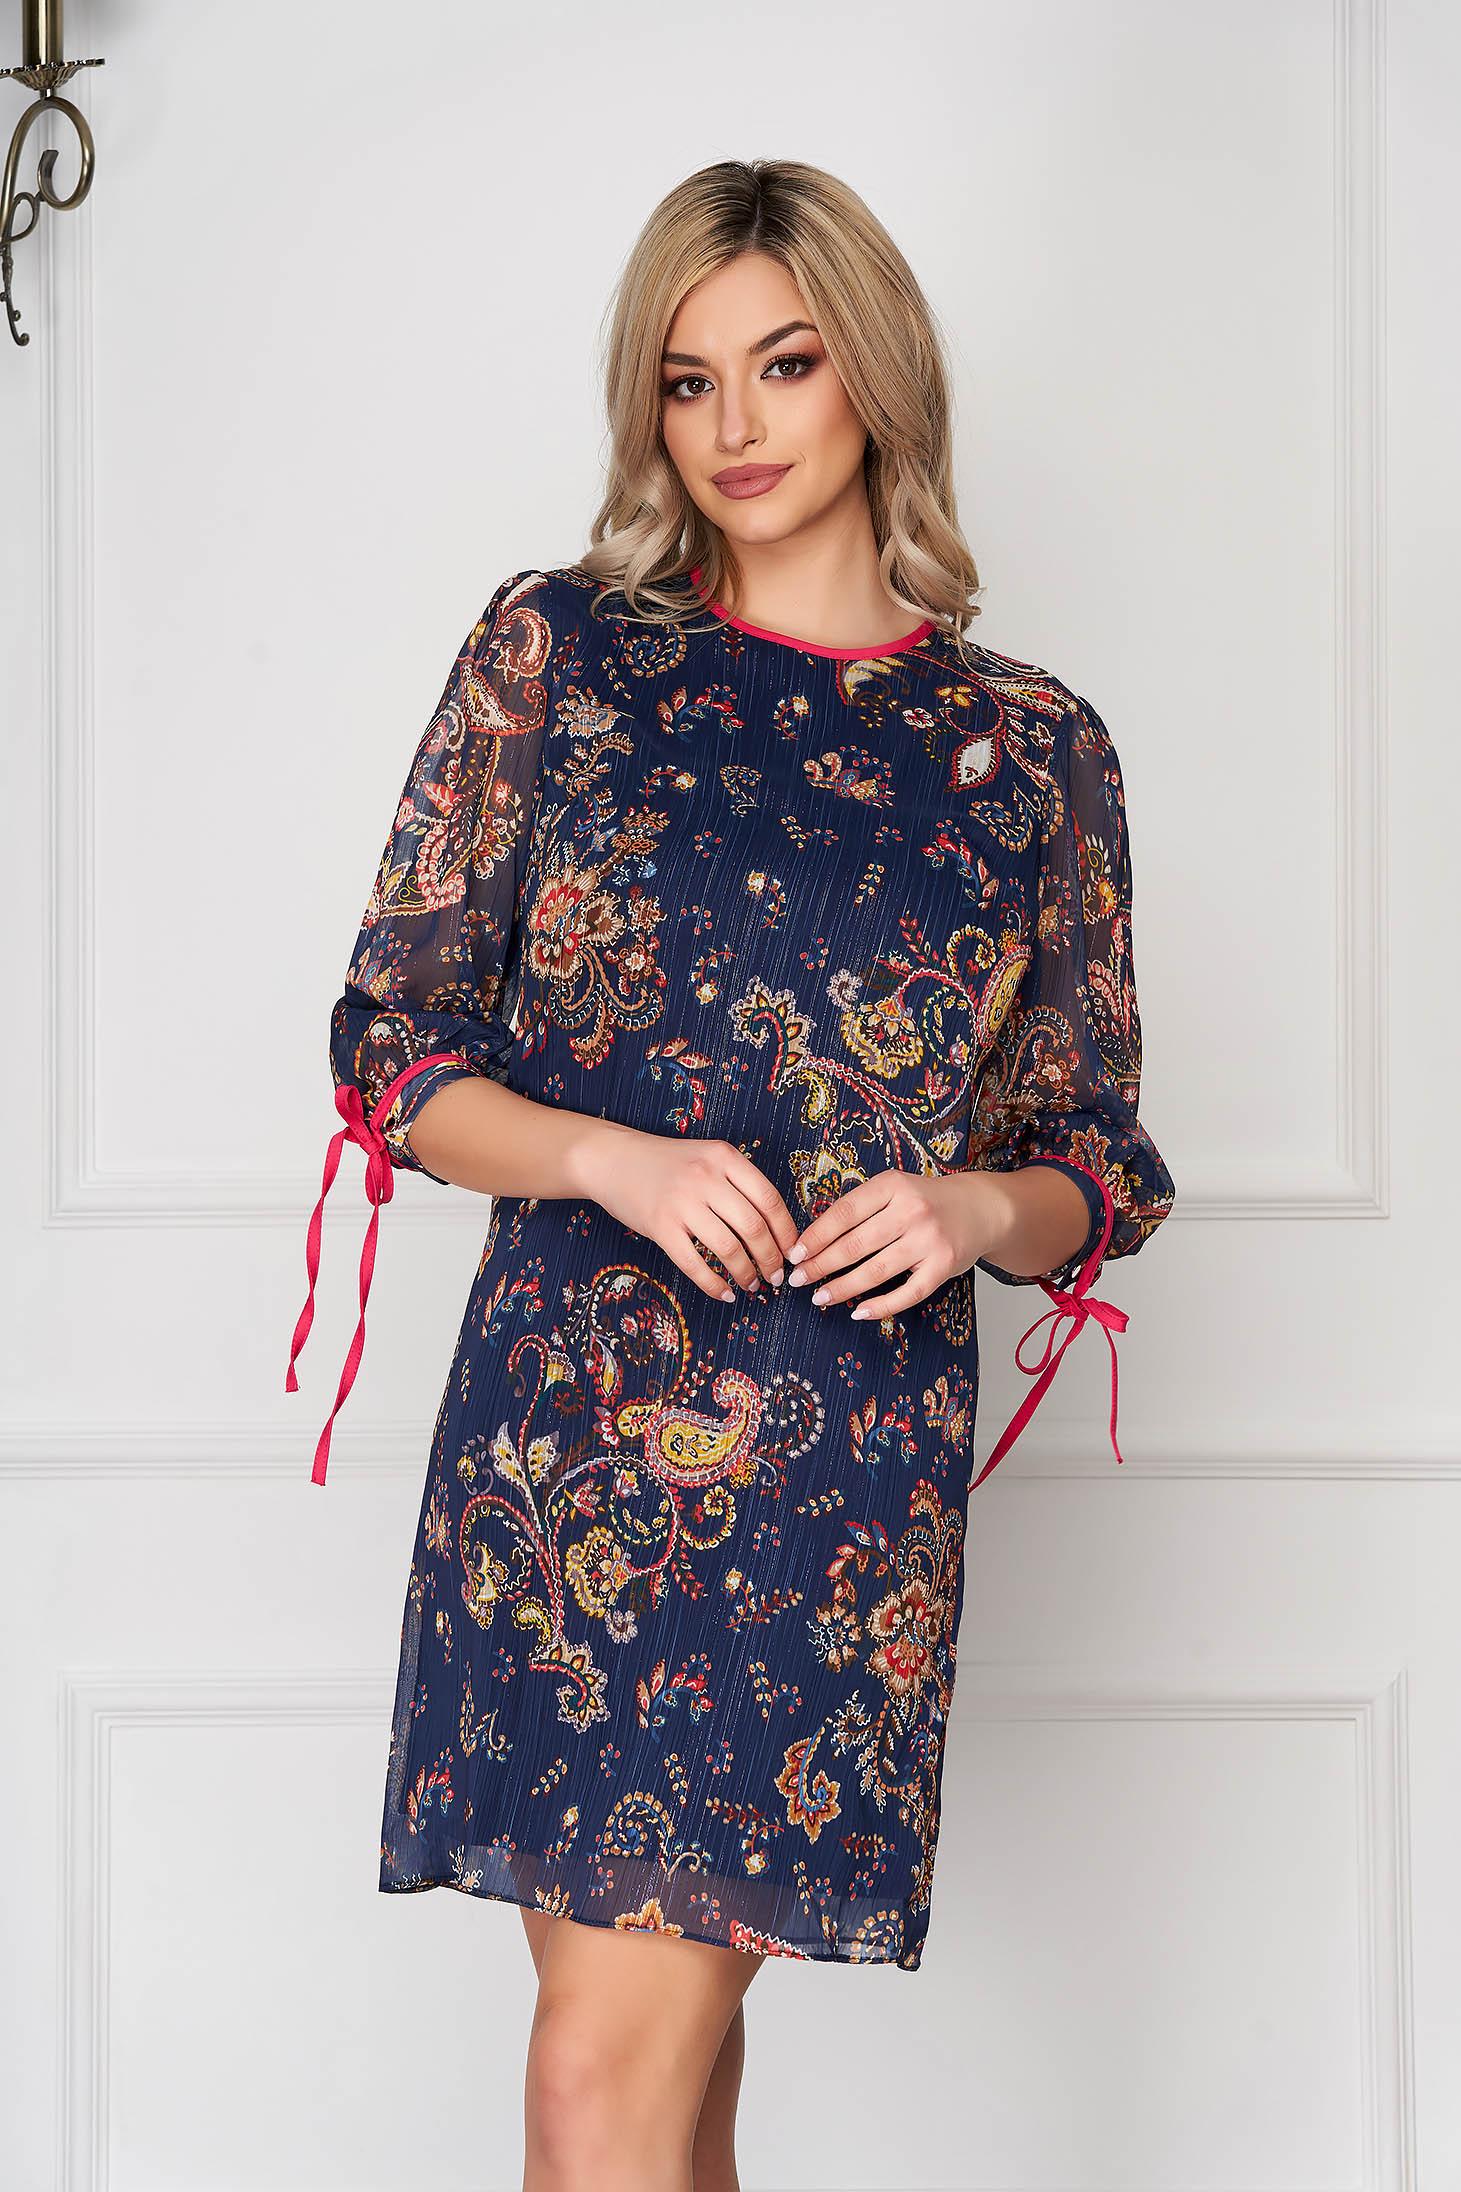 Rochie albastru-inchis scurta de zi cu un croi drept din voal cu fir lame si maneci trei-sferturi